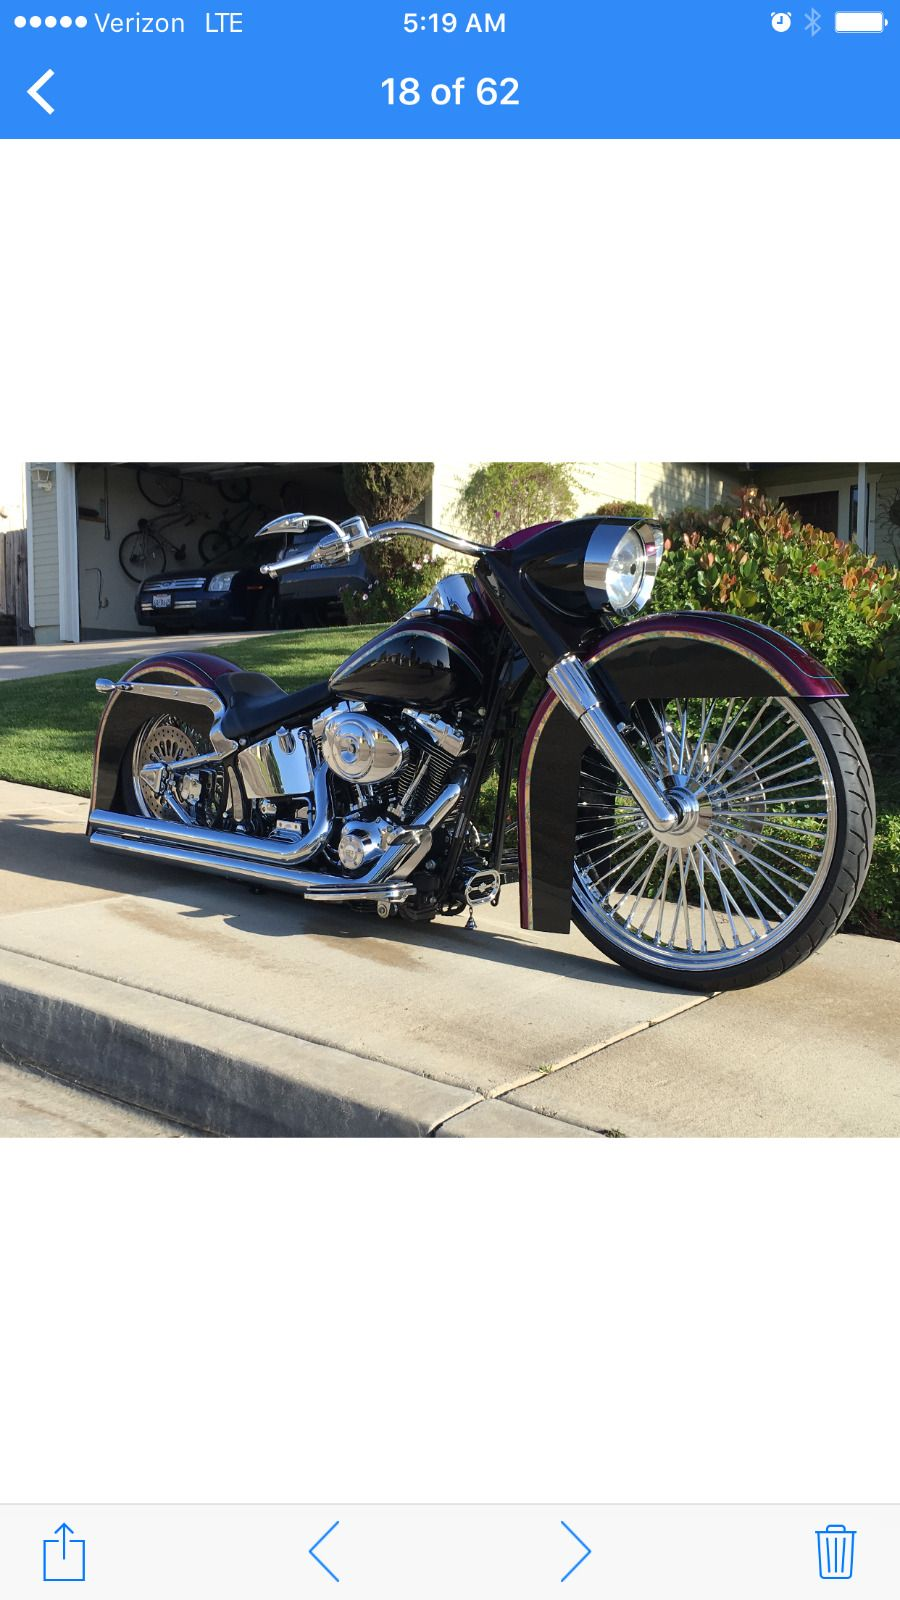 2003 Harley-Davidson Softail   | eBay